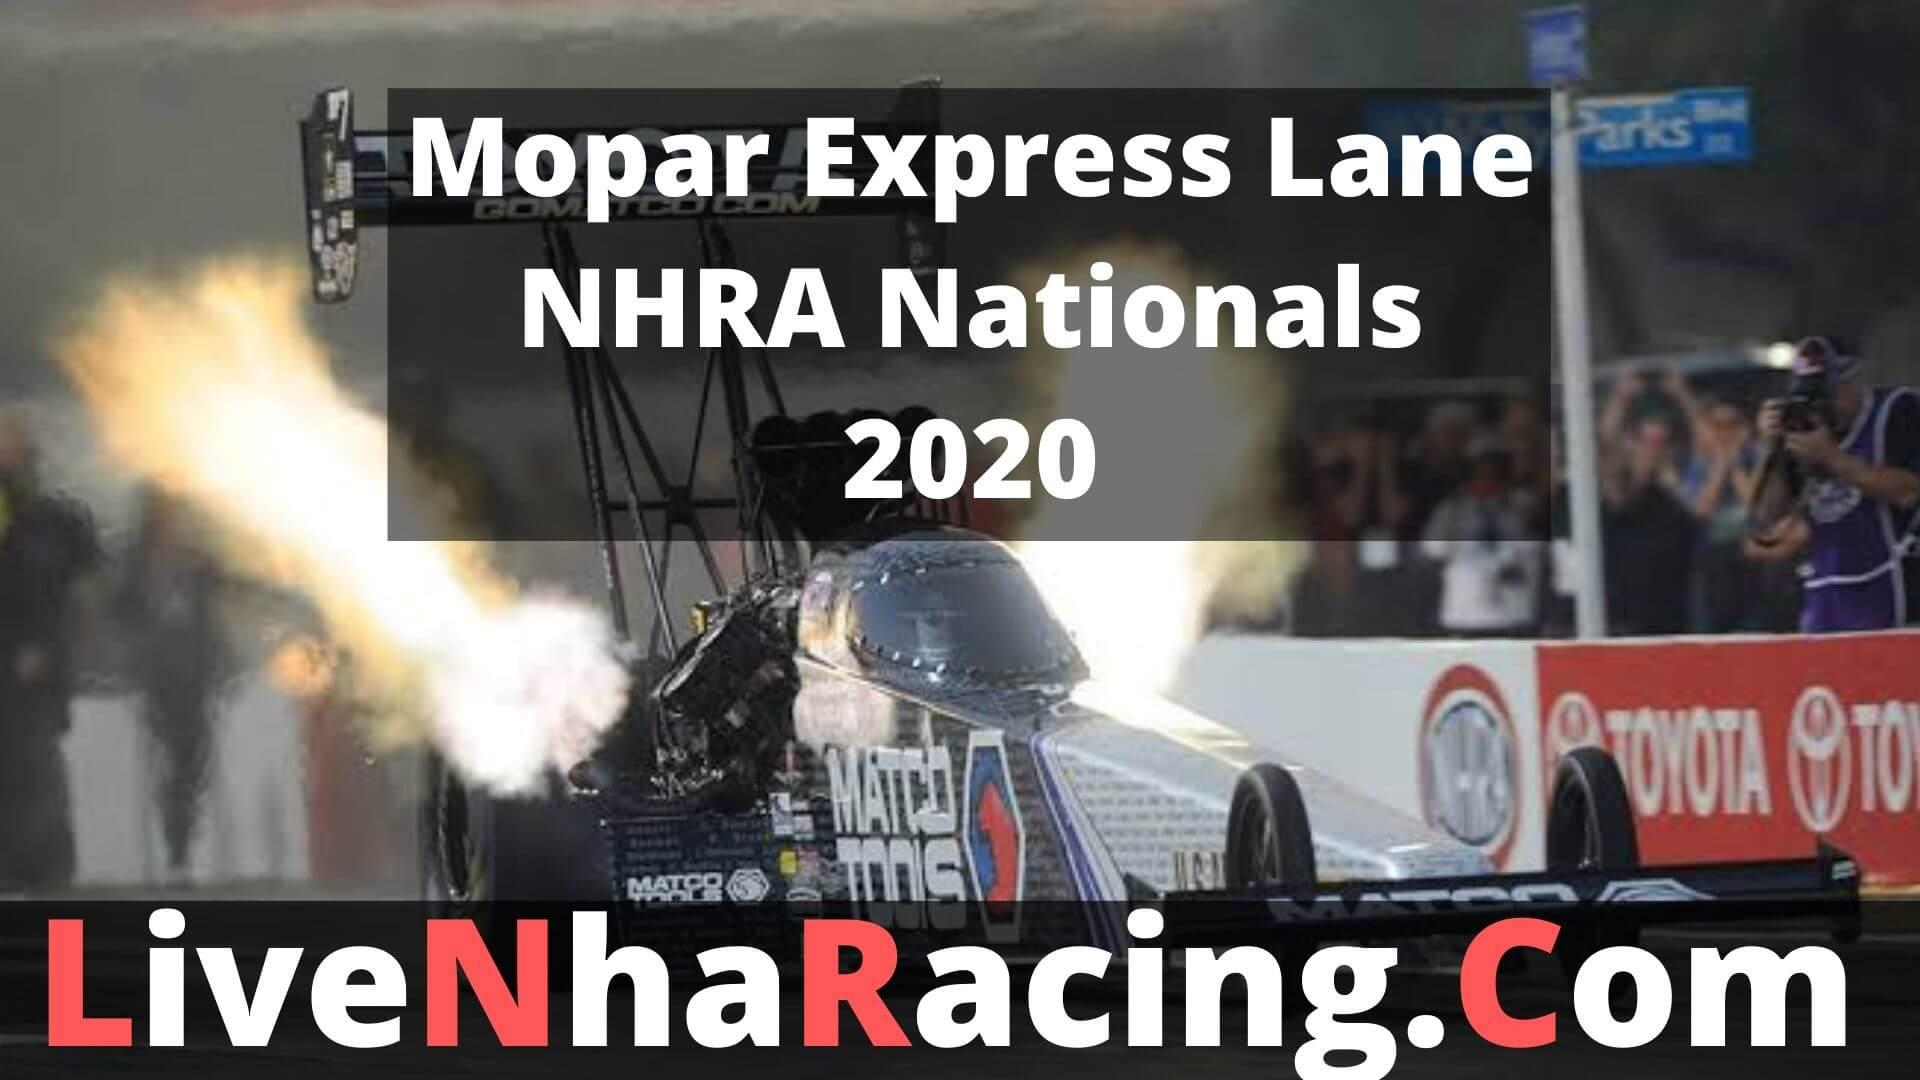 Mopar Express Lane NHRA Nationals Live Stream